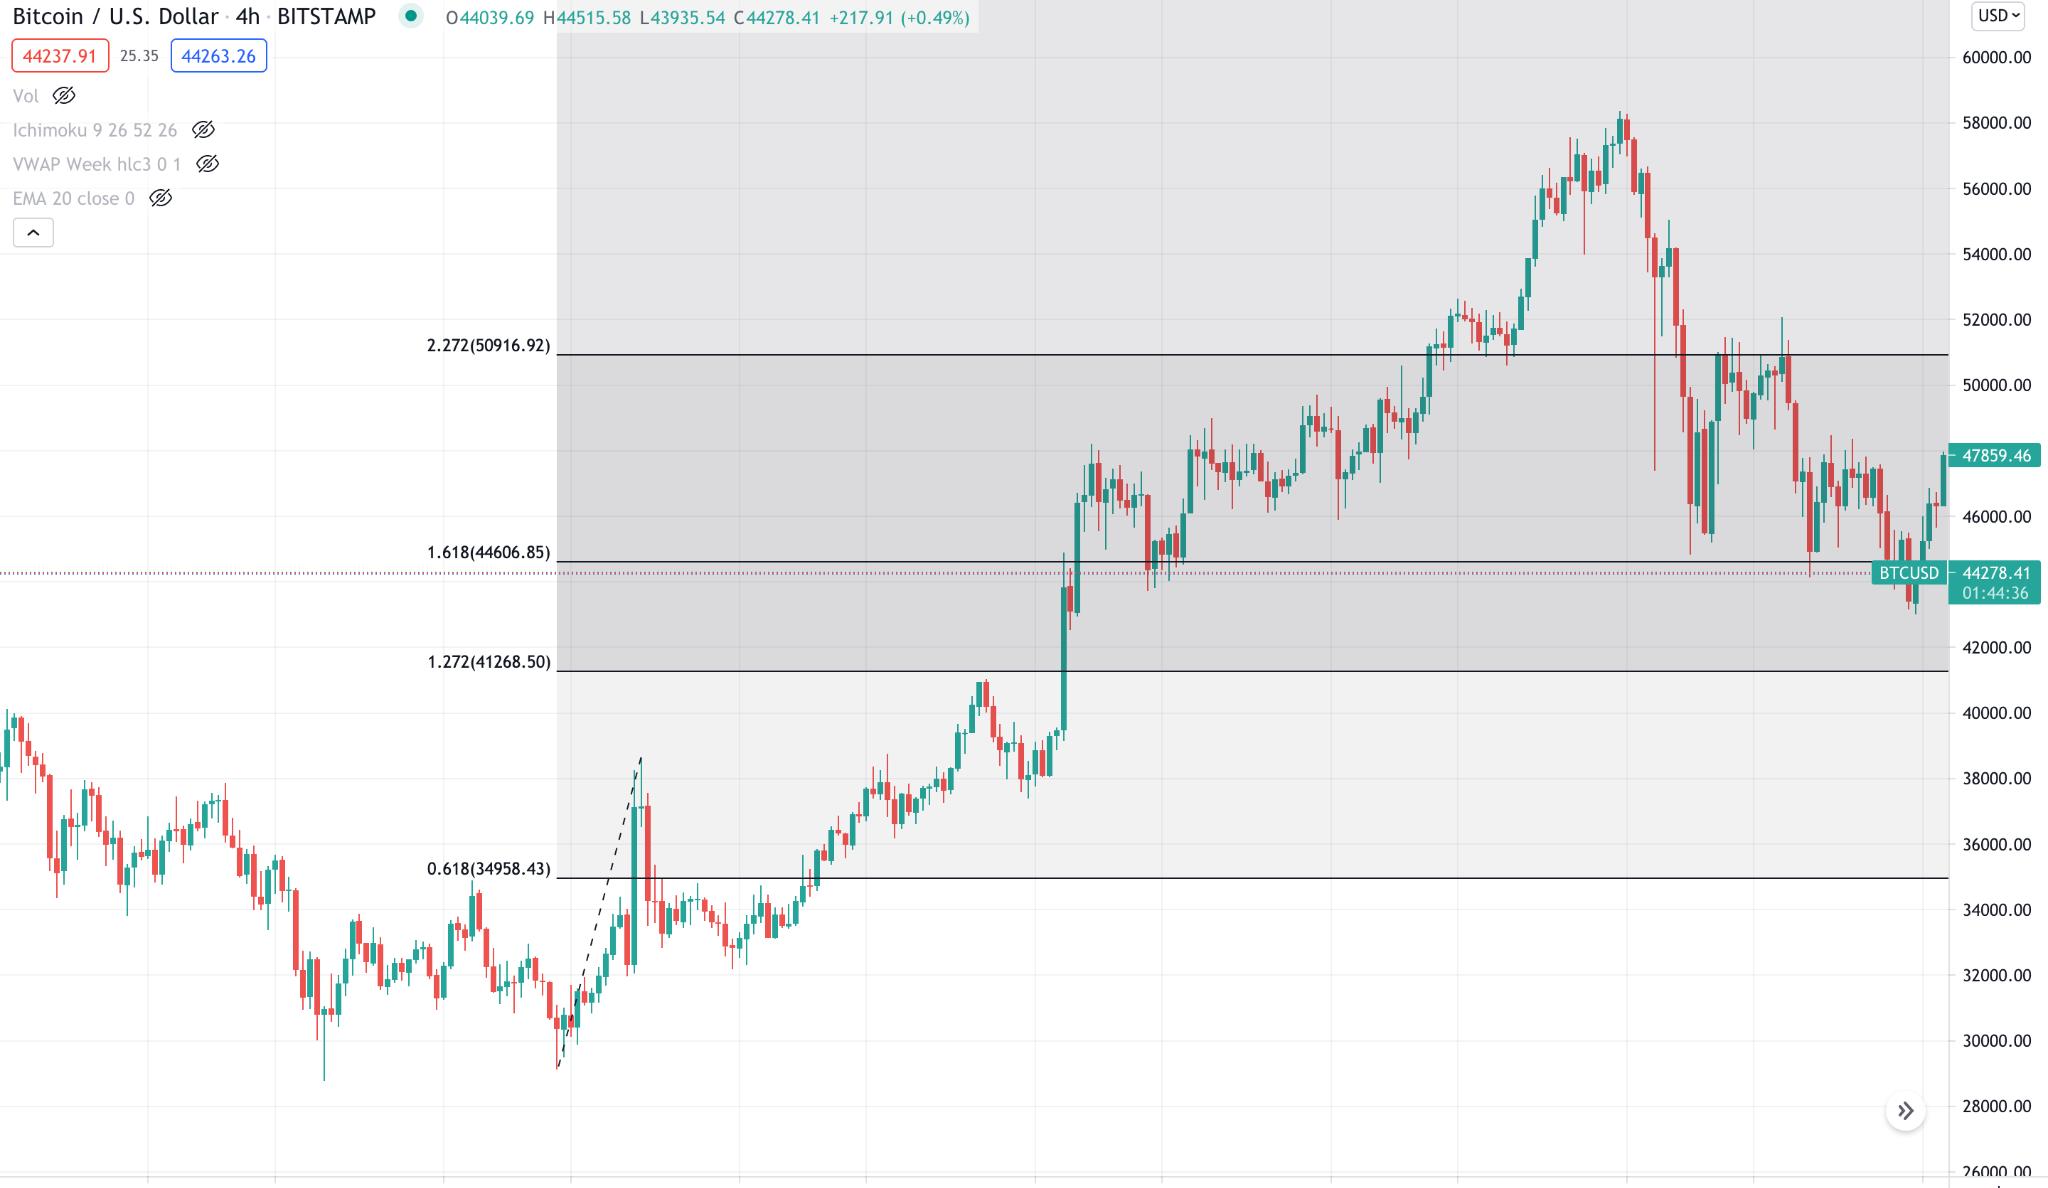 Fibonacci extension to confirm the possible profit target level.